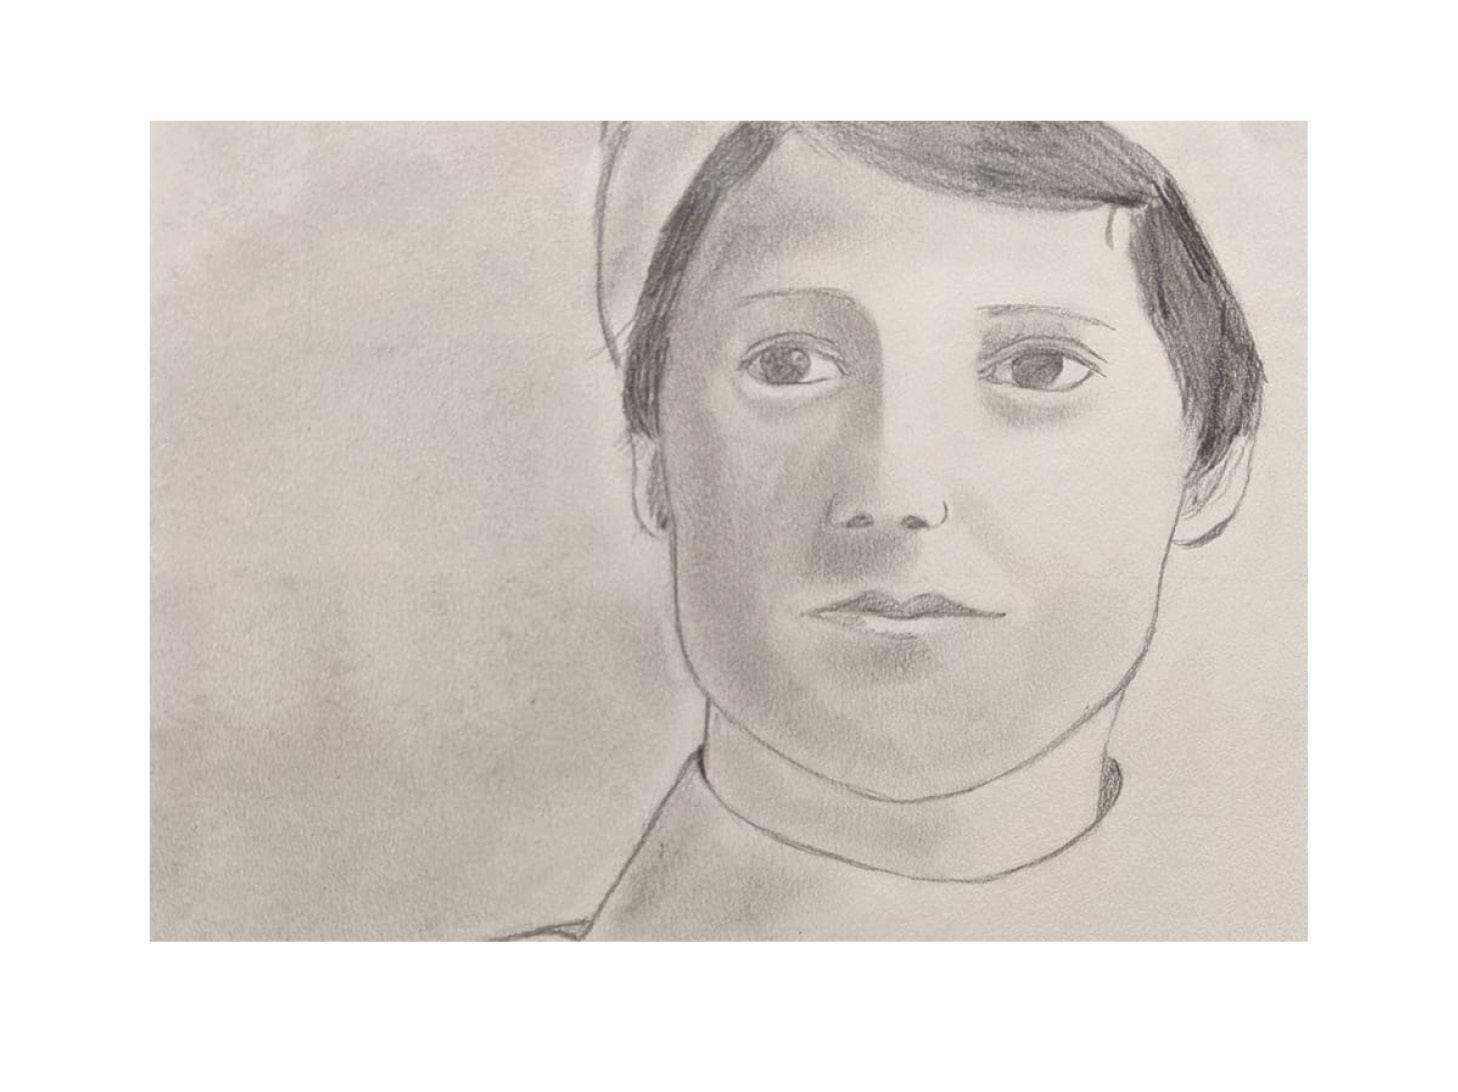 Sketch of a self portrait